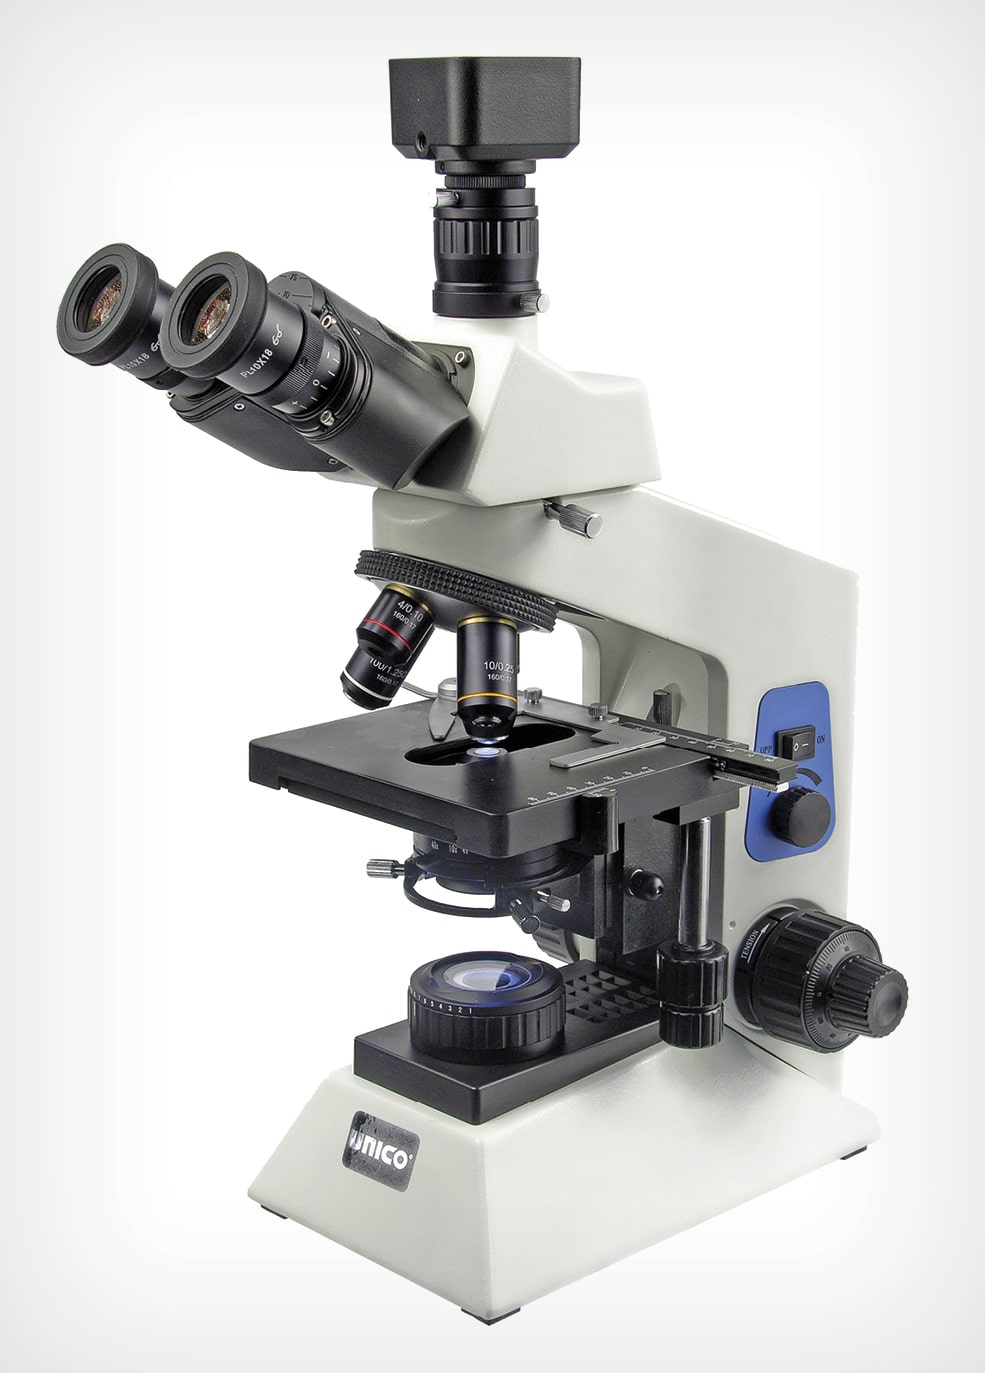 Figure 1. A trinocular head microscope with attached digital camera. (UNICO Microscope; courtesy of VetLab Supply, Palmetto Bay, Florida)